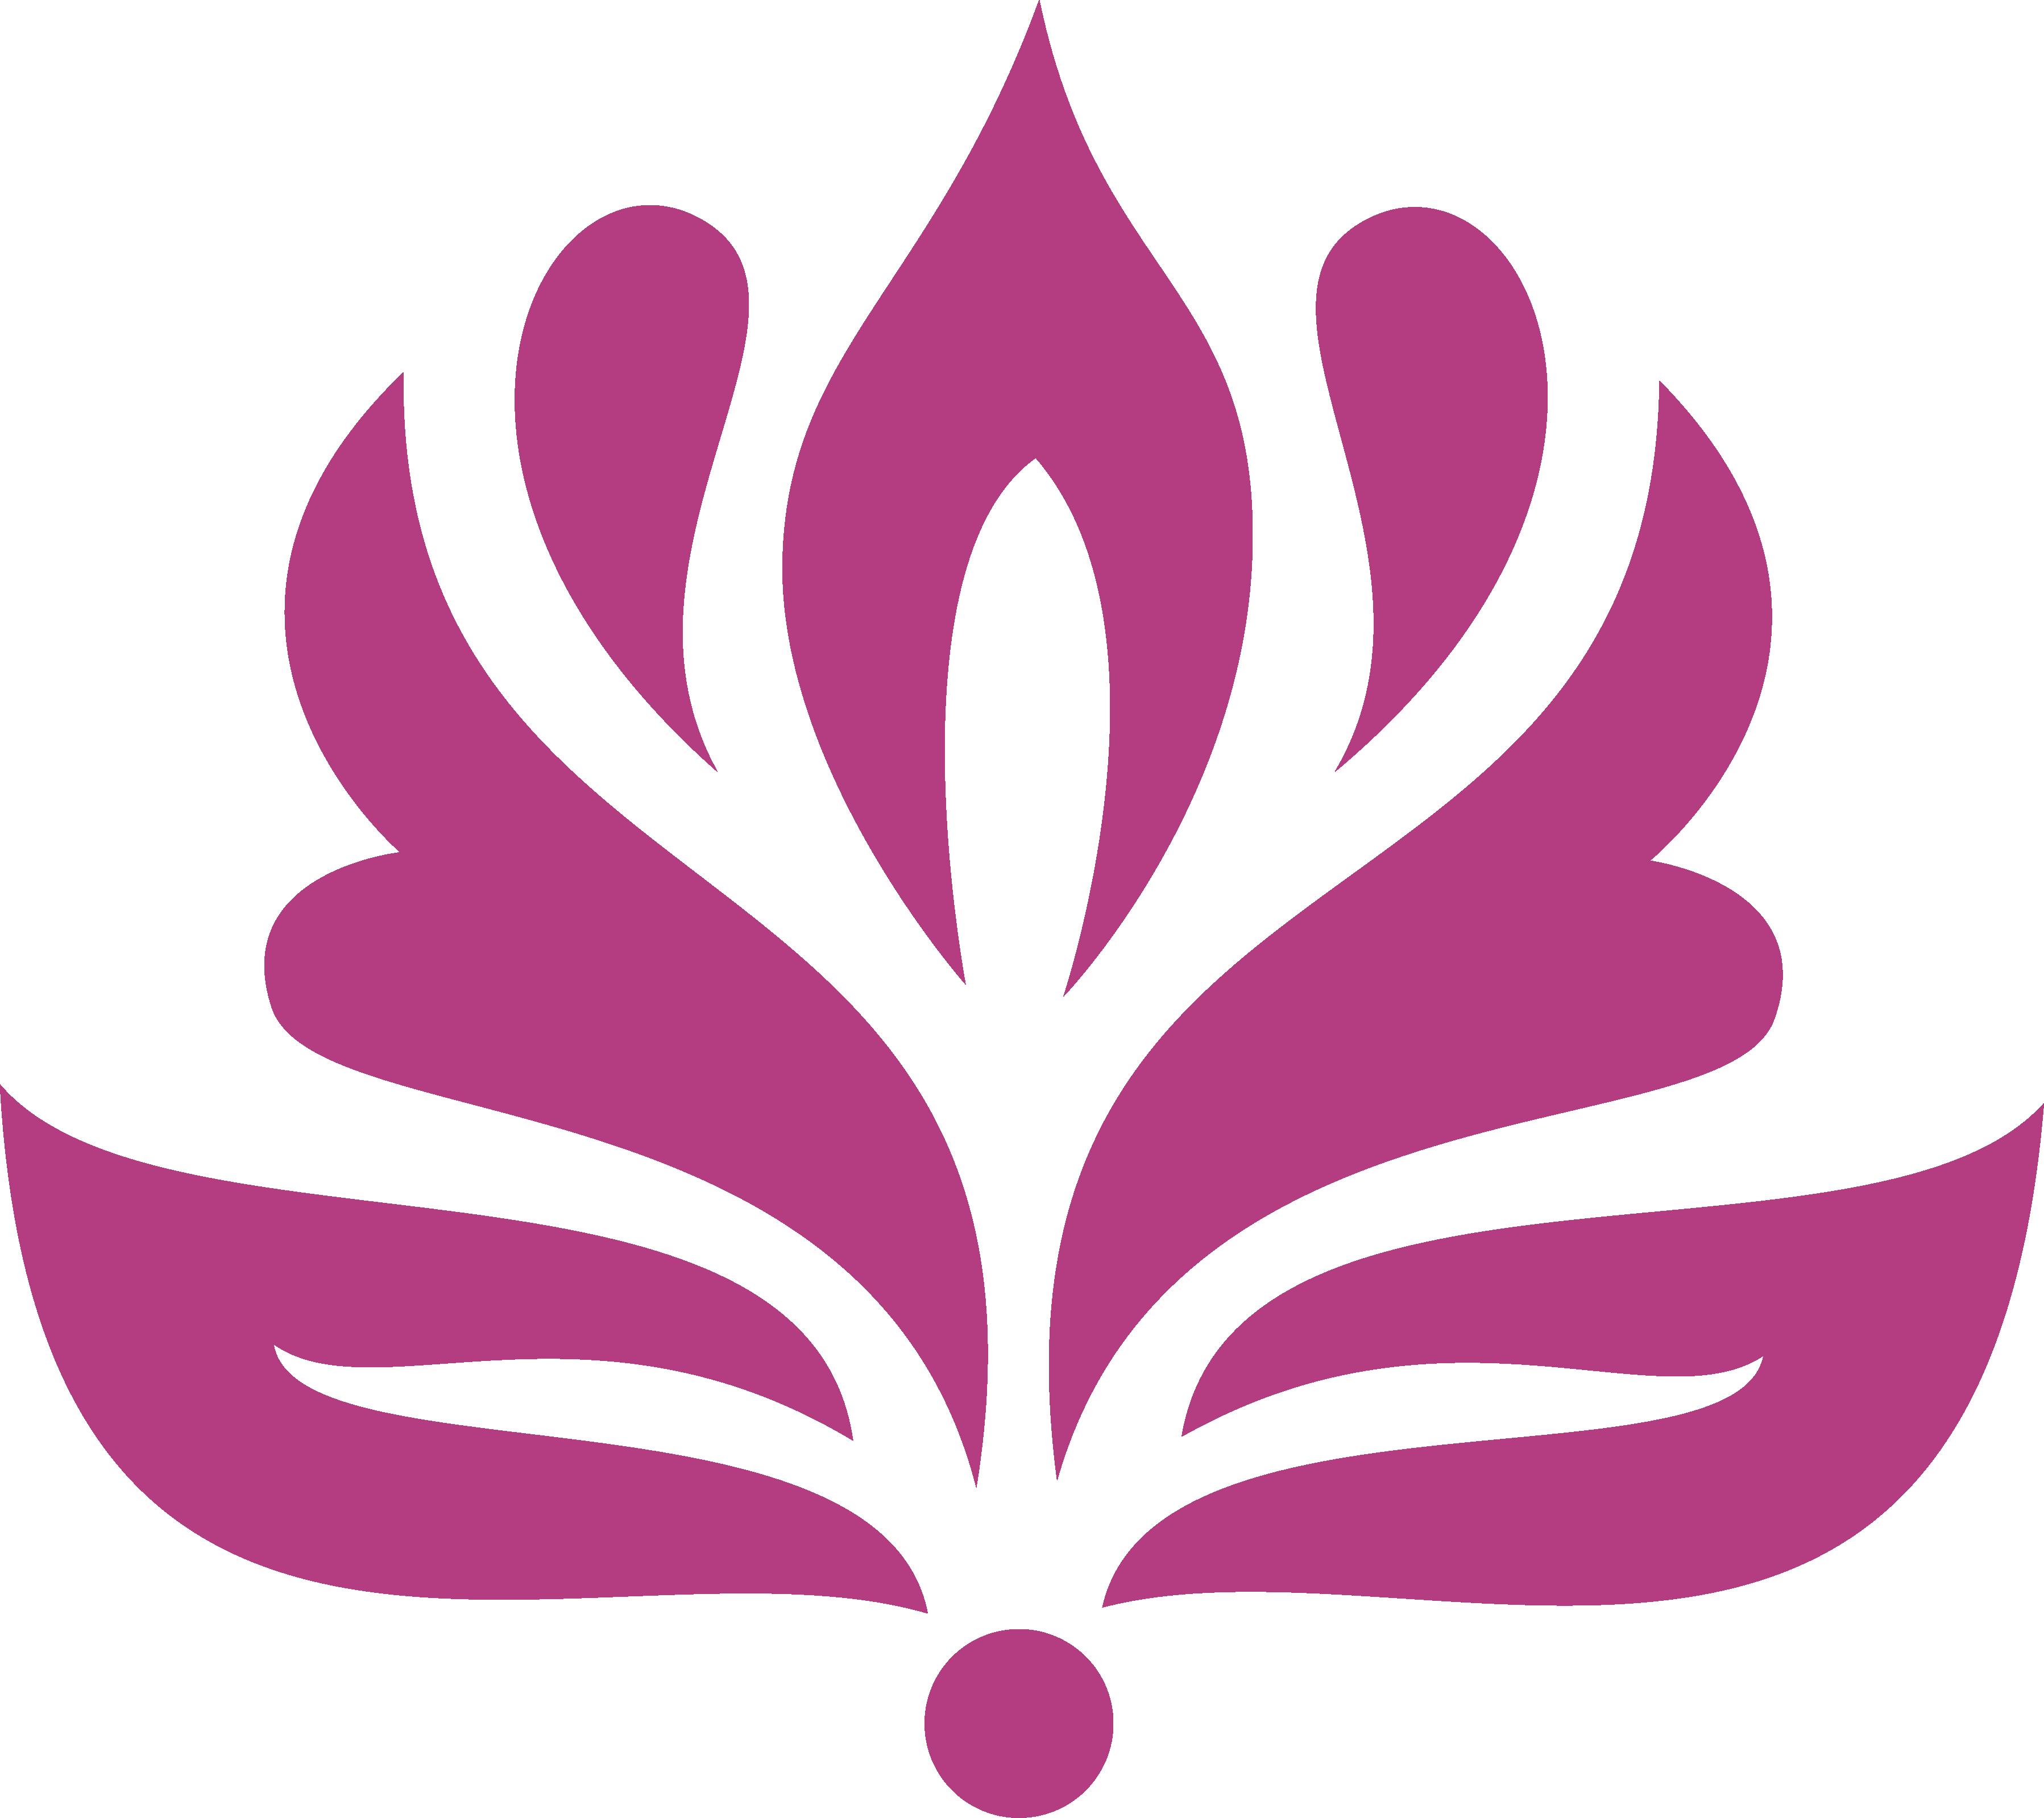 Ảnh mẫu logo hoa sen PNG